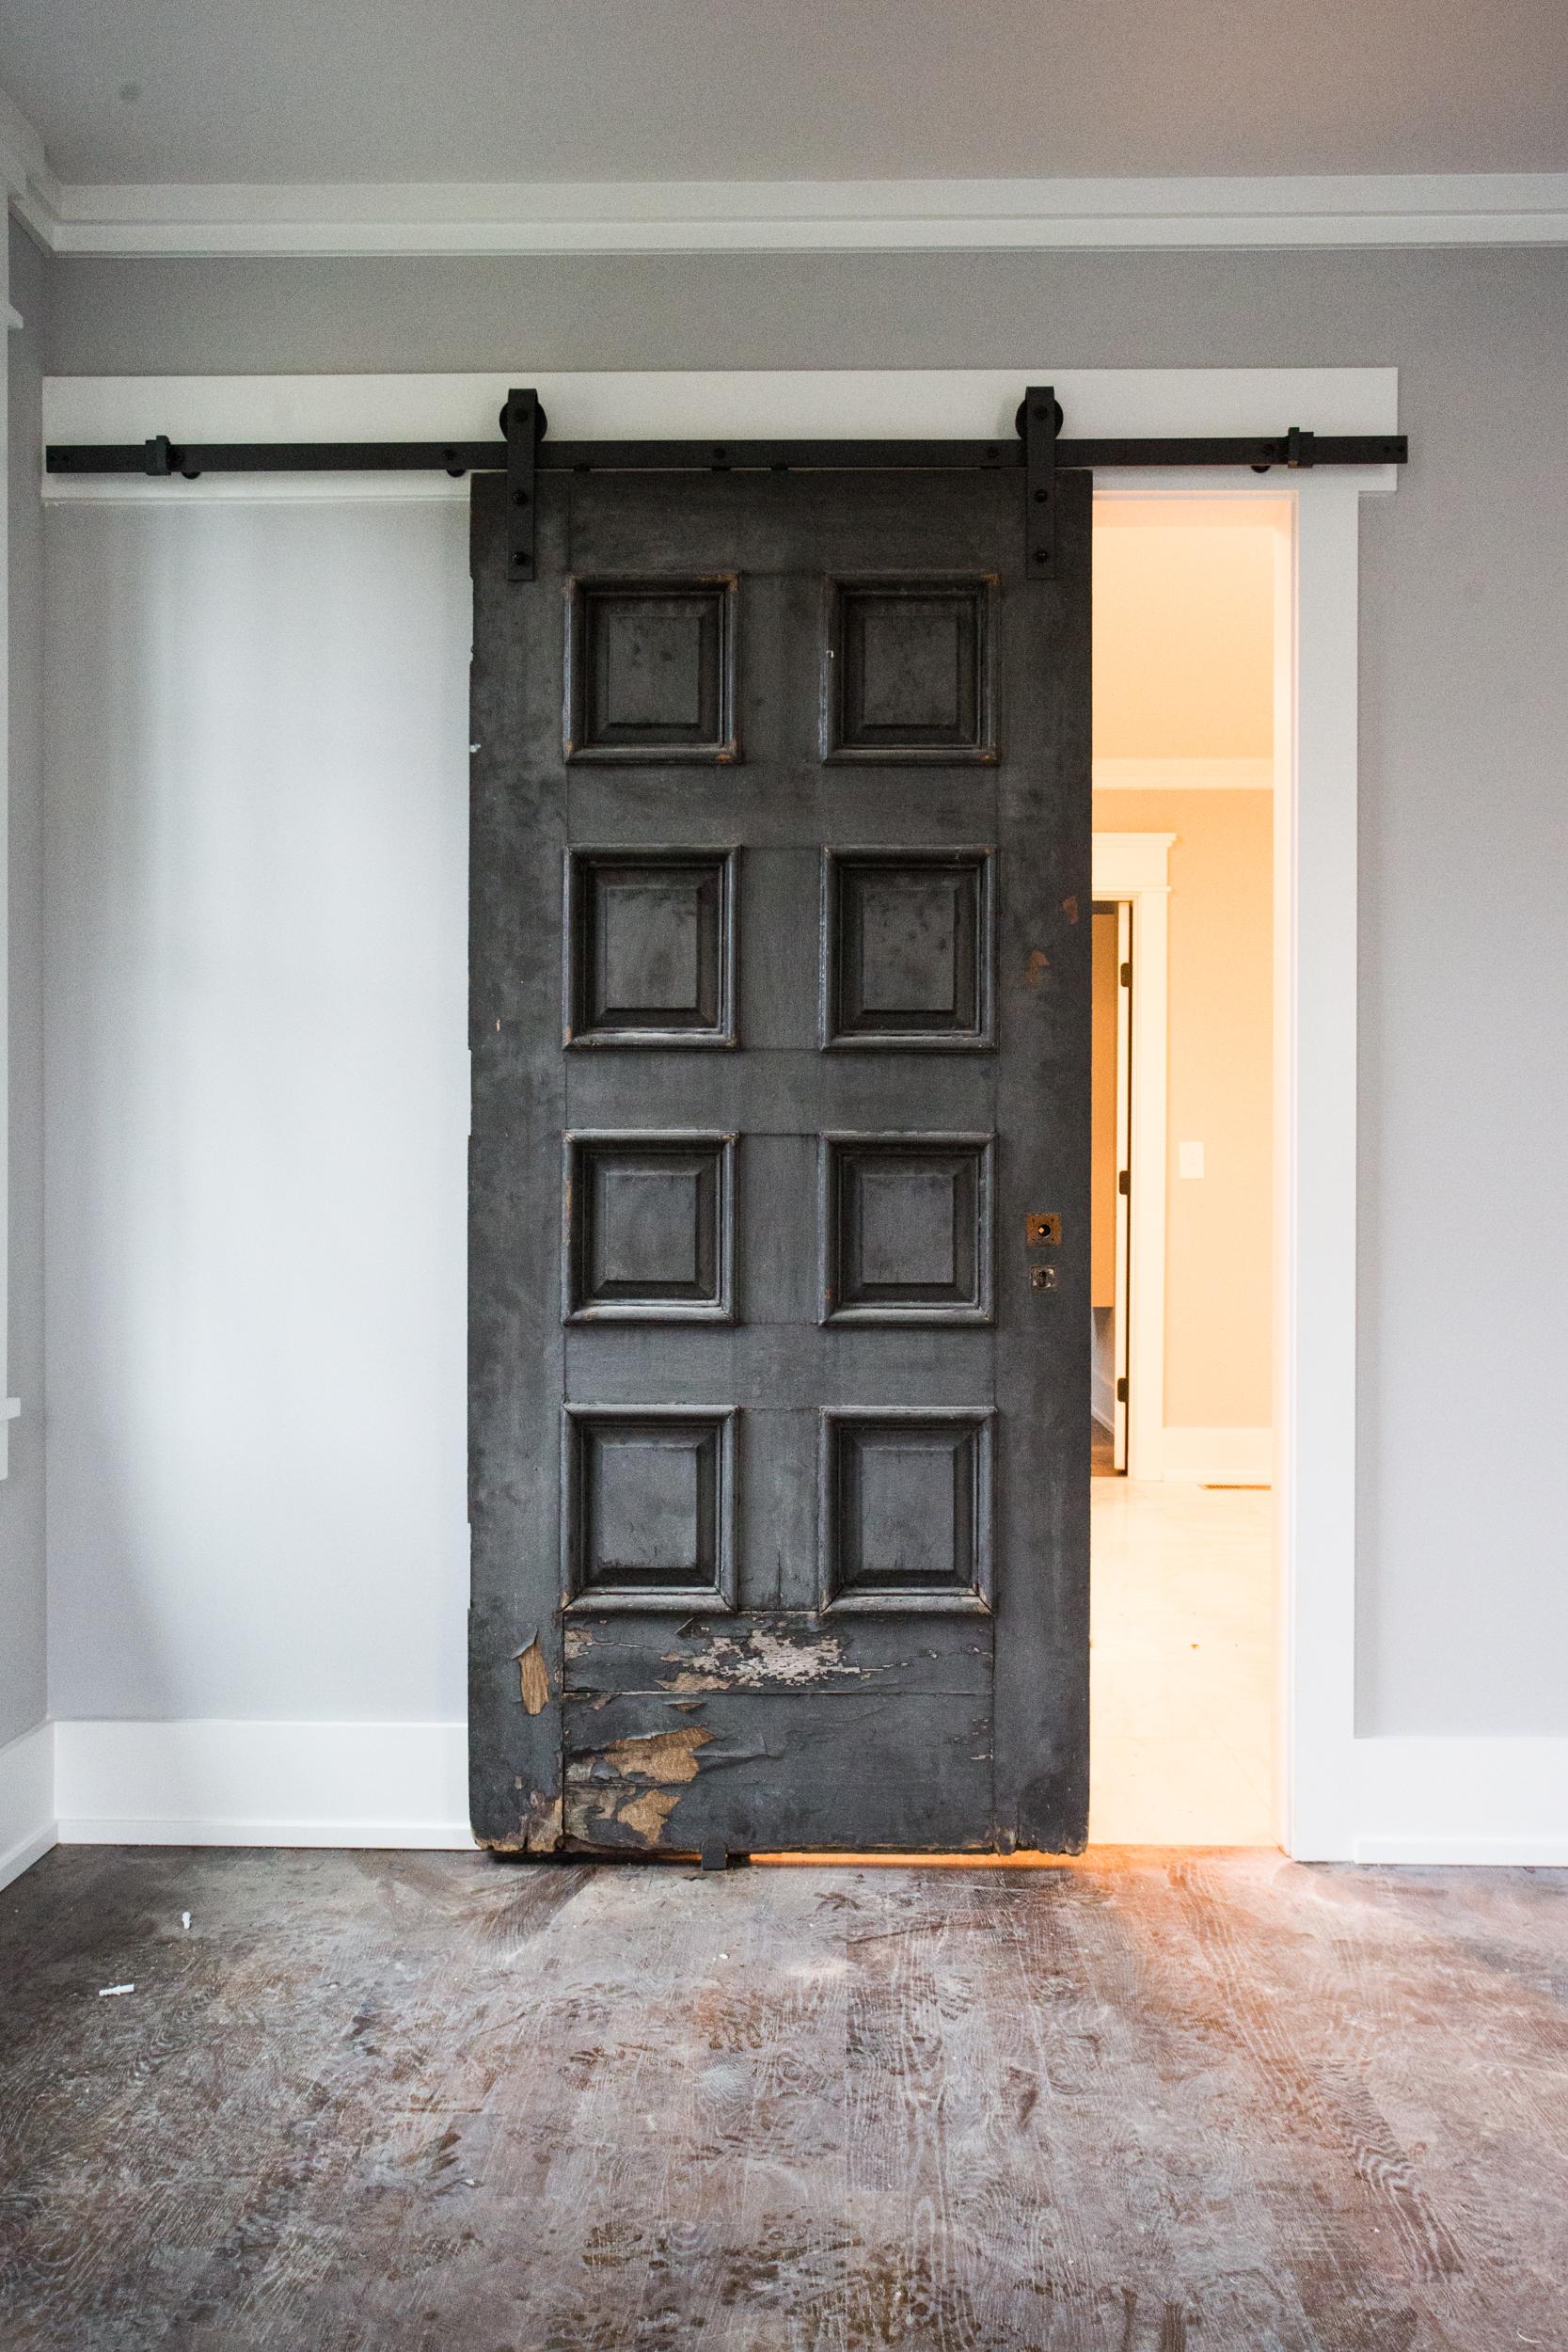 britt-development-group-nashville-tennessee-custom-home-builder-historic-restoration-0803.jpg